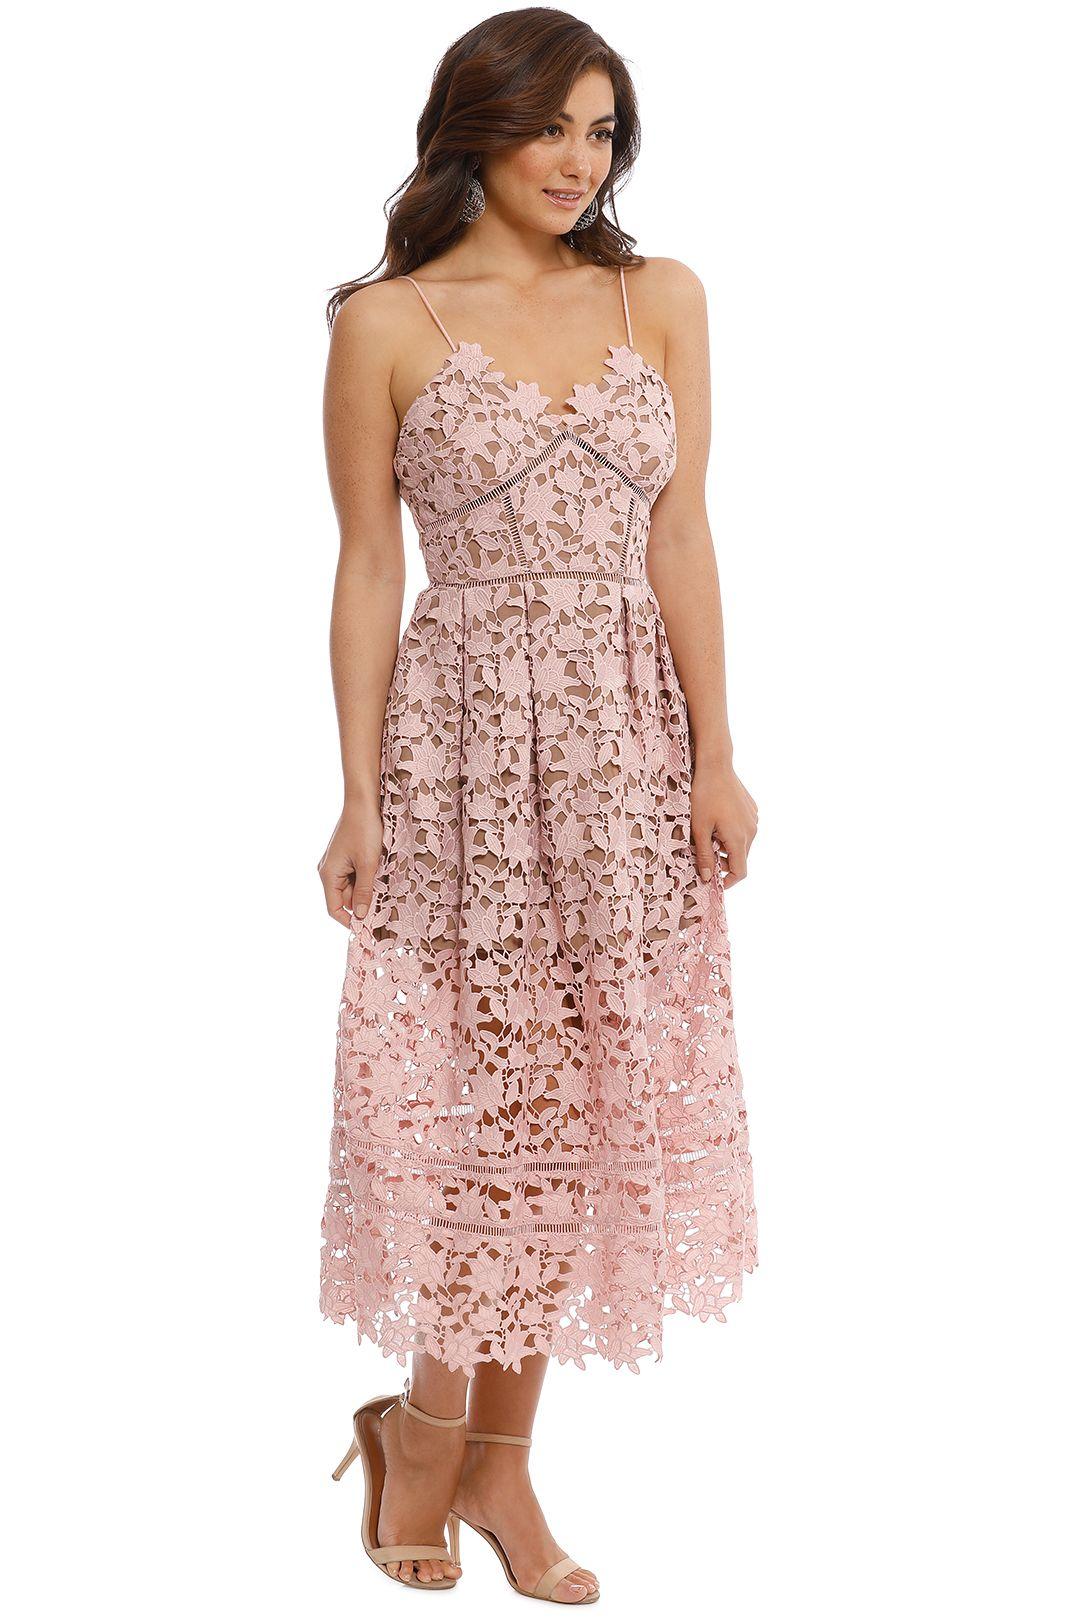 Self Portrait - Azaelea Lace Midi Dress - Pale Pink - Side